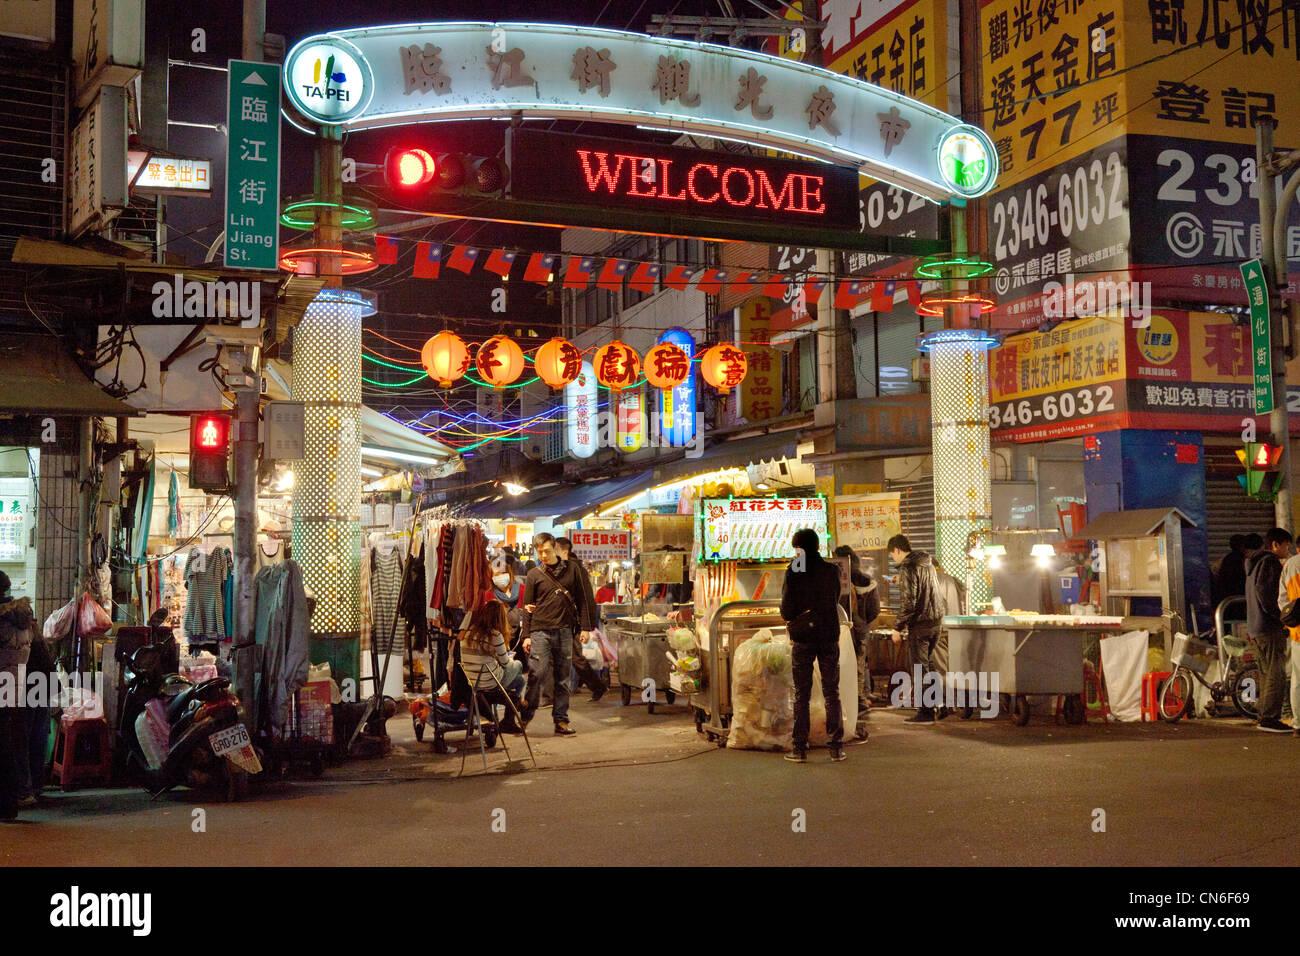 Ingresso Linjiang Street (Tonghua) Mercato Notturno Taipei Taiwan. JMH5751 Immagini Stock